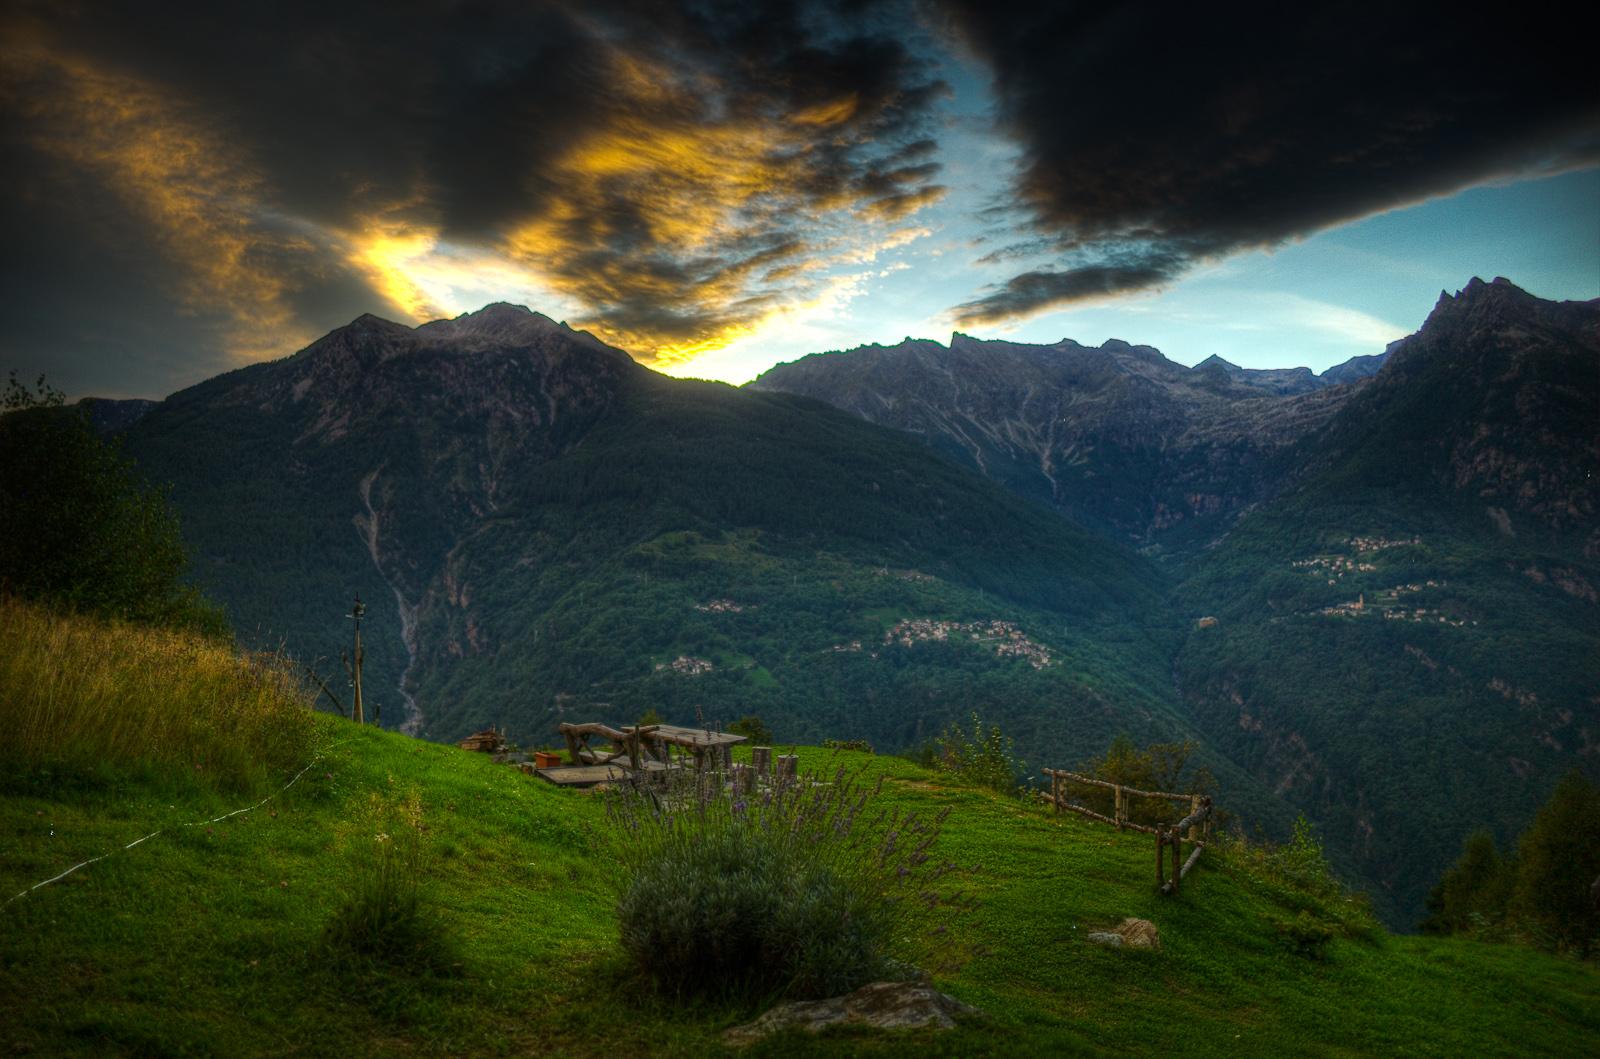 The perfect picnic spot, Presalbert, San Giacomo Filippo